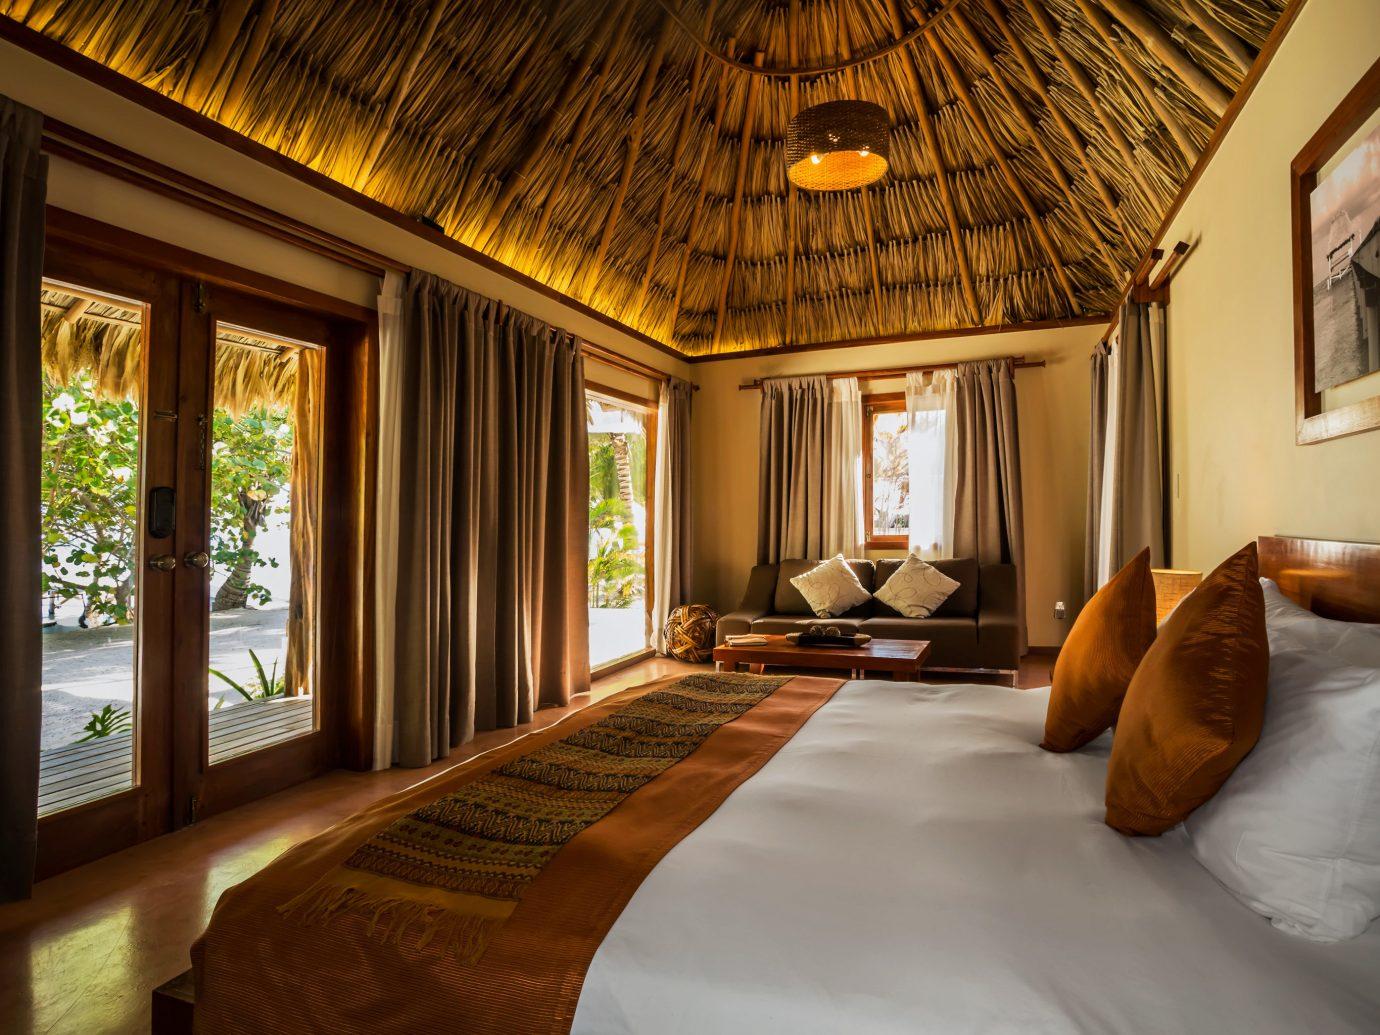 Bedroom At El Secreto In Belize